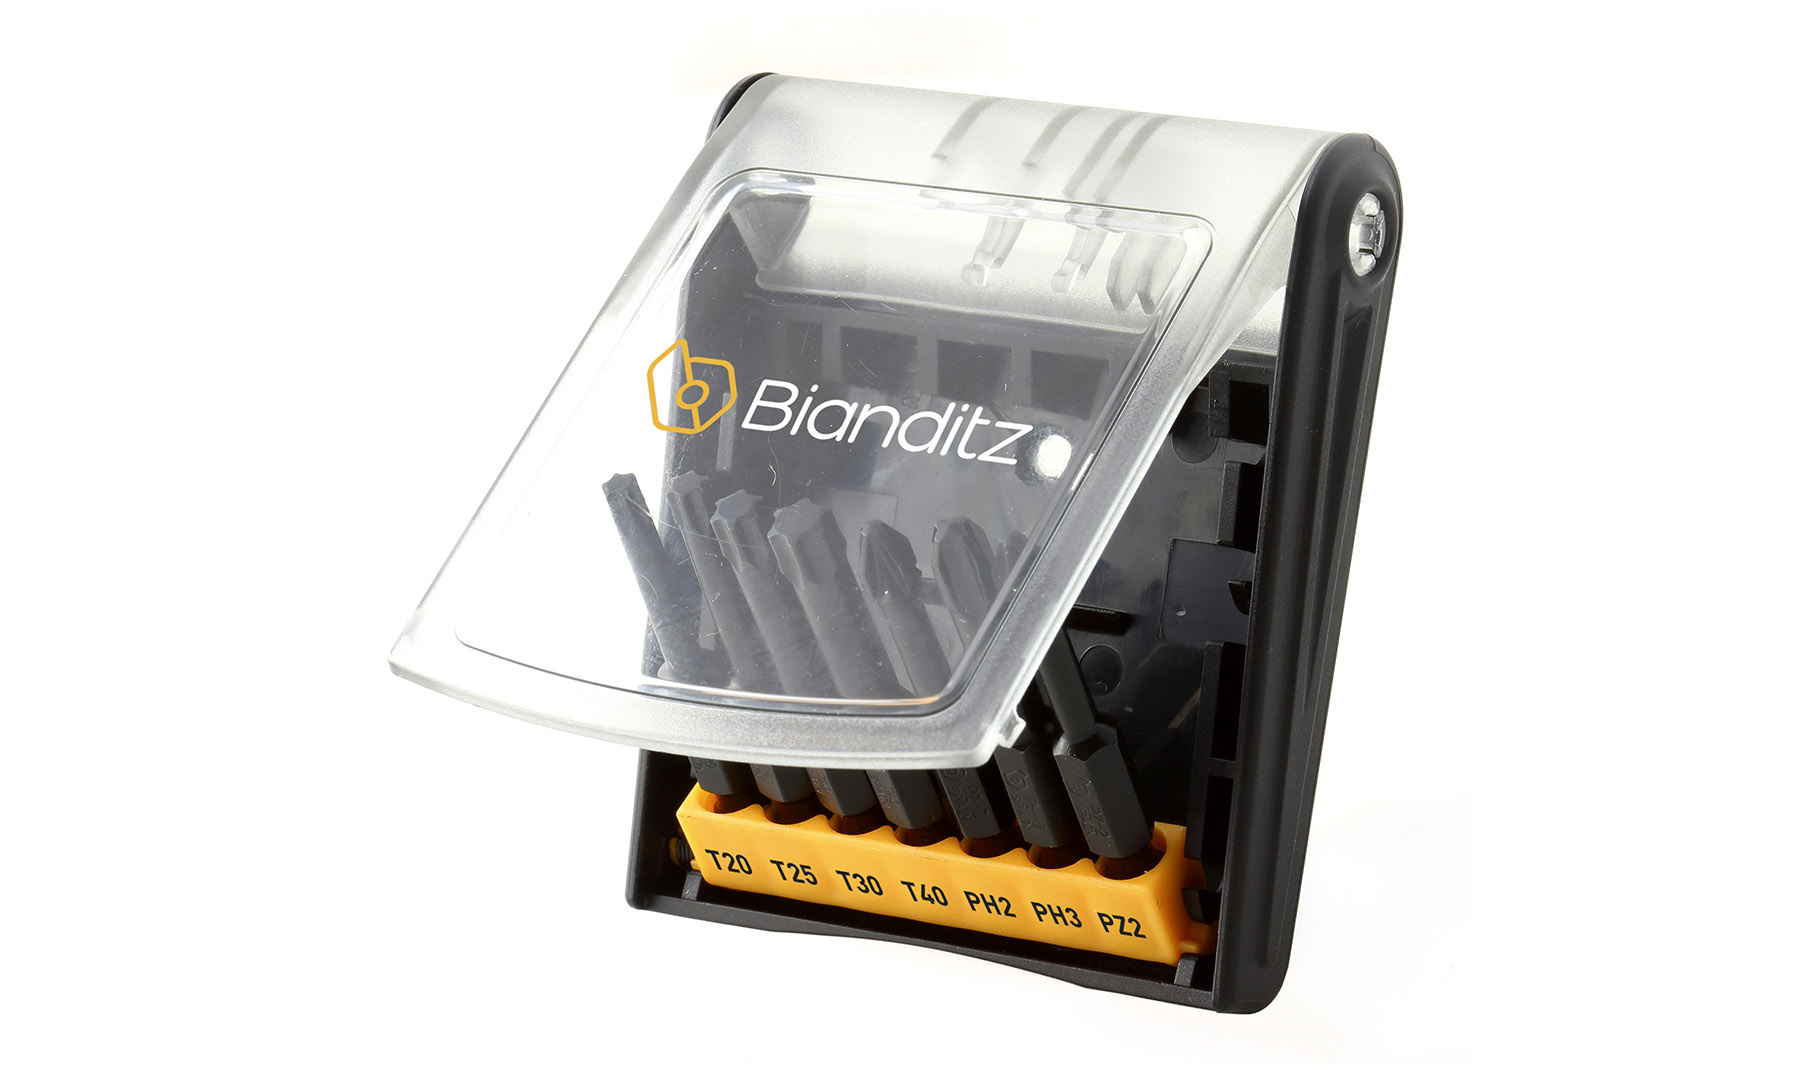 puntas de impacto Bianditz